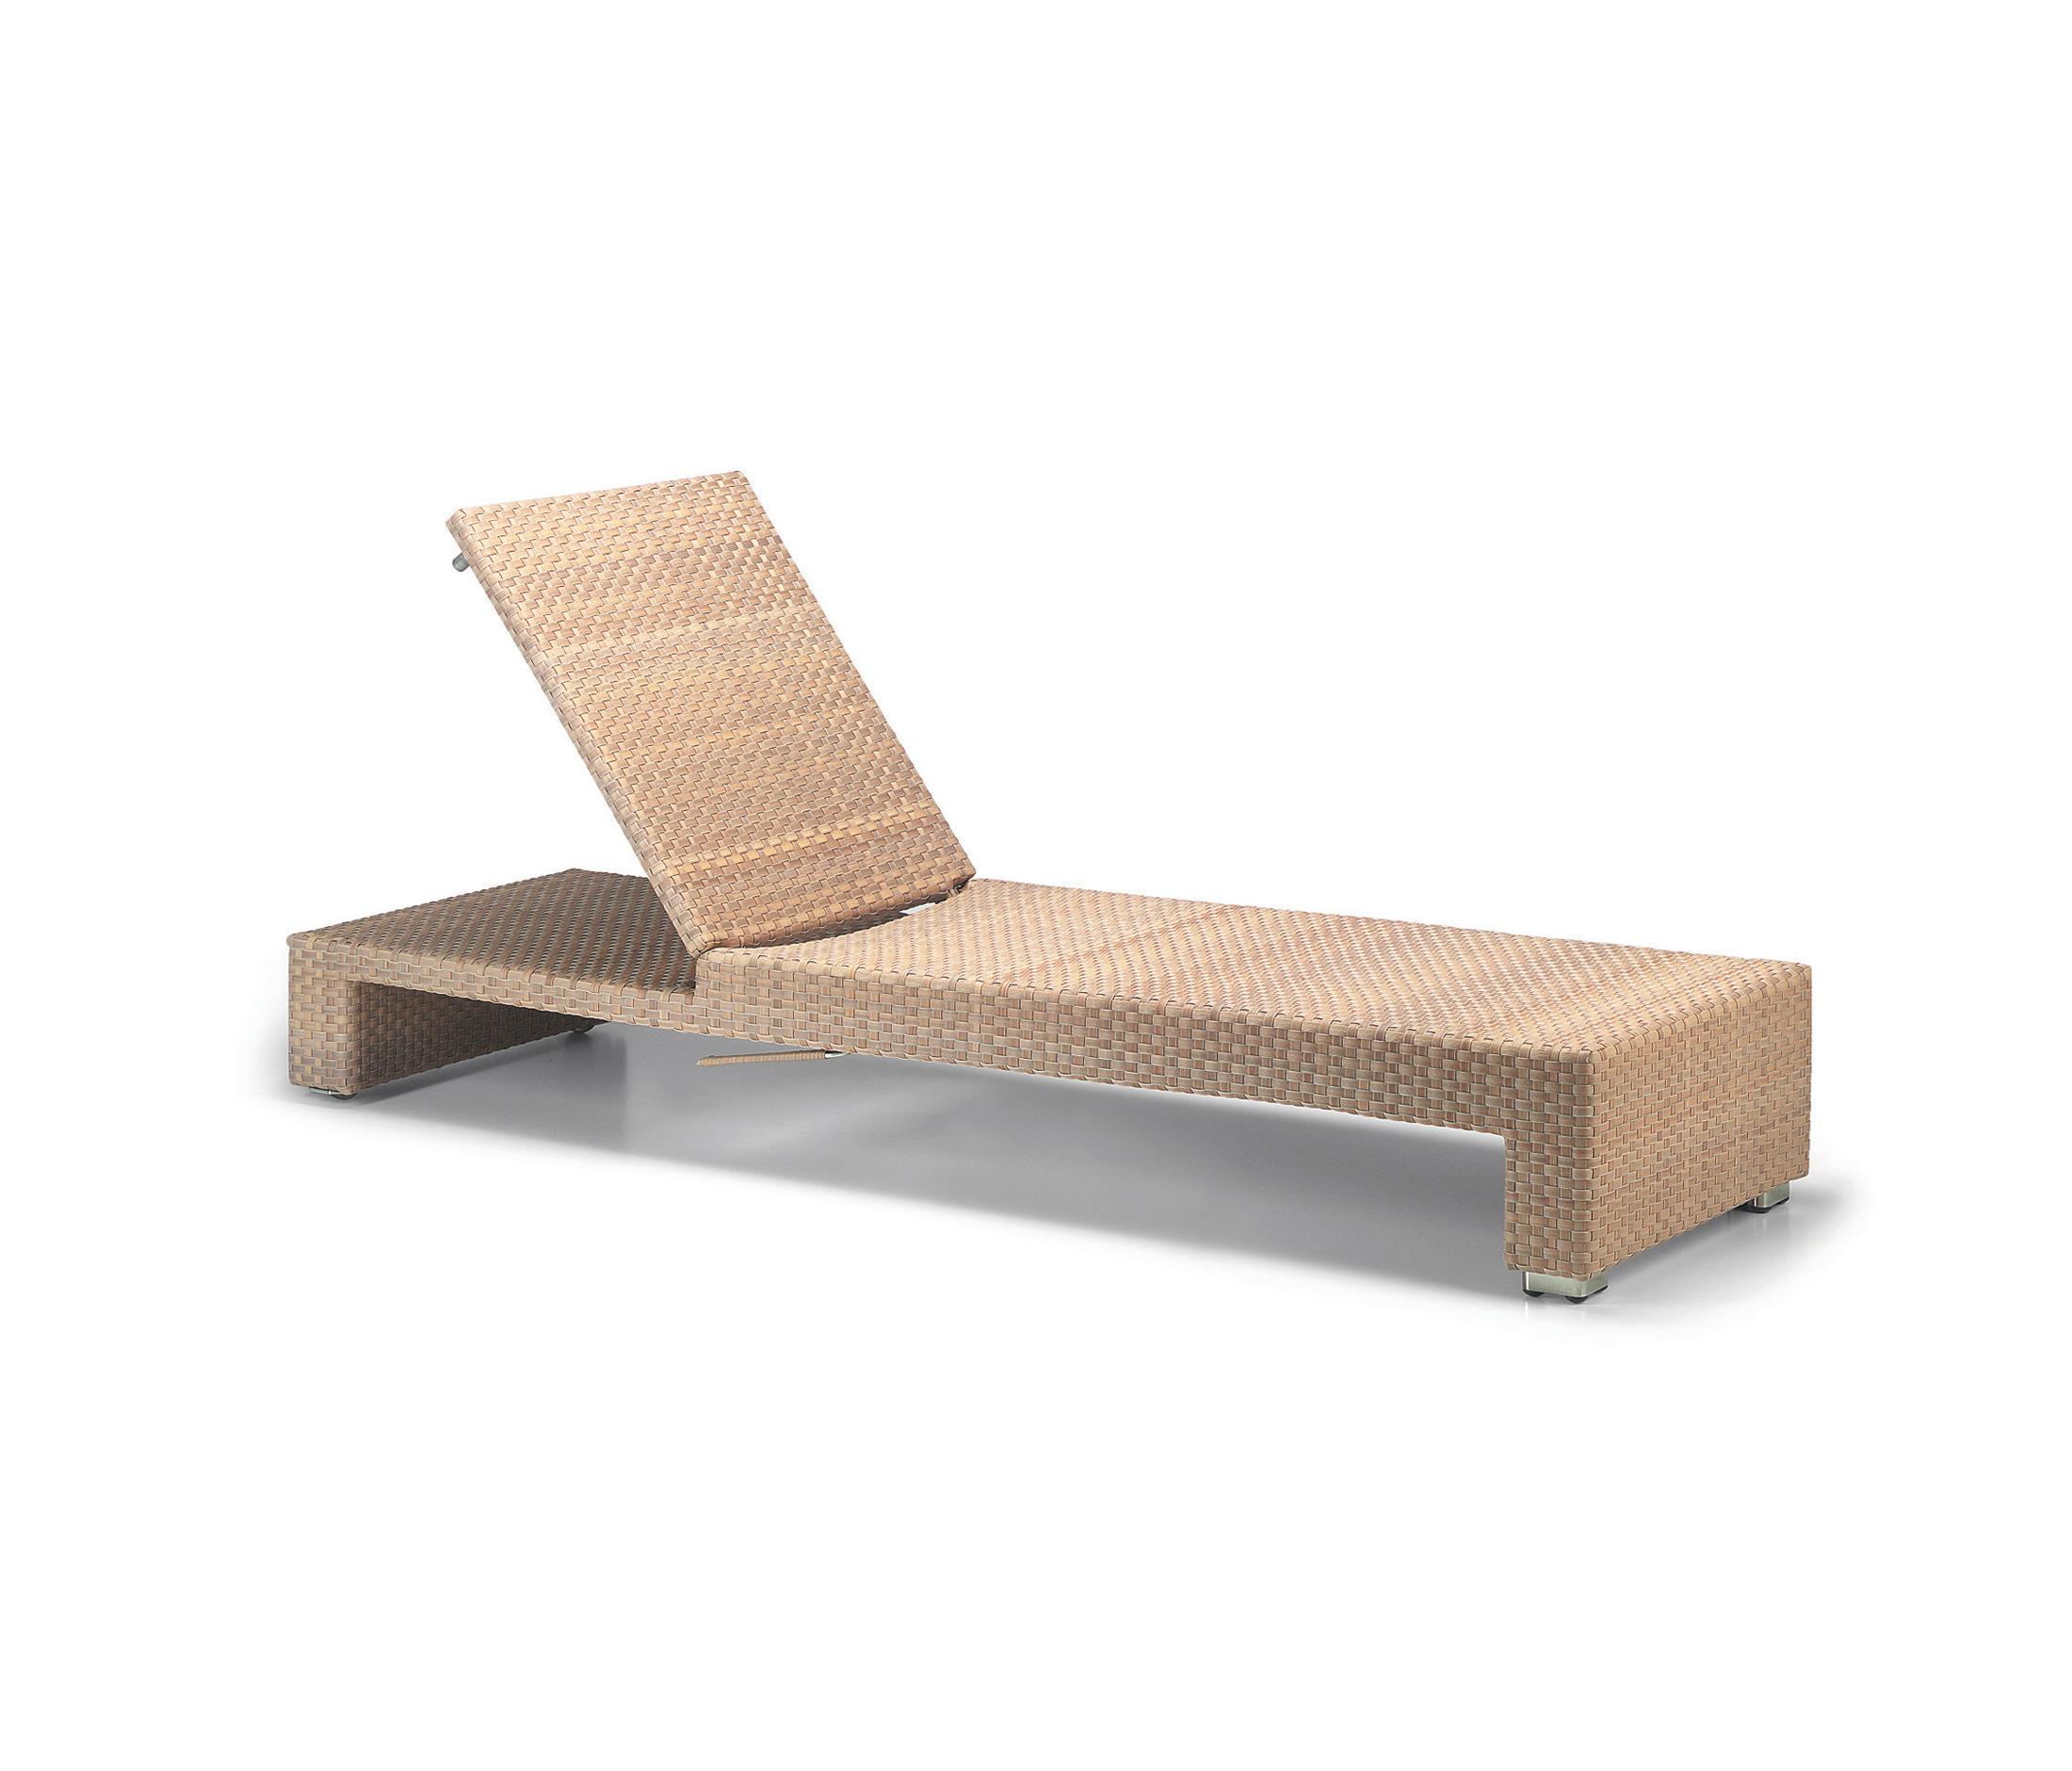 L gant chaise longue de jardin sabakunohana for Chaise longue de jardin